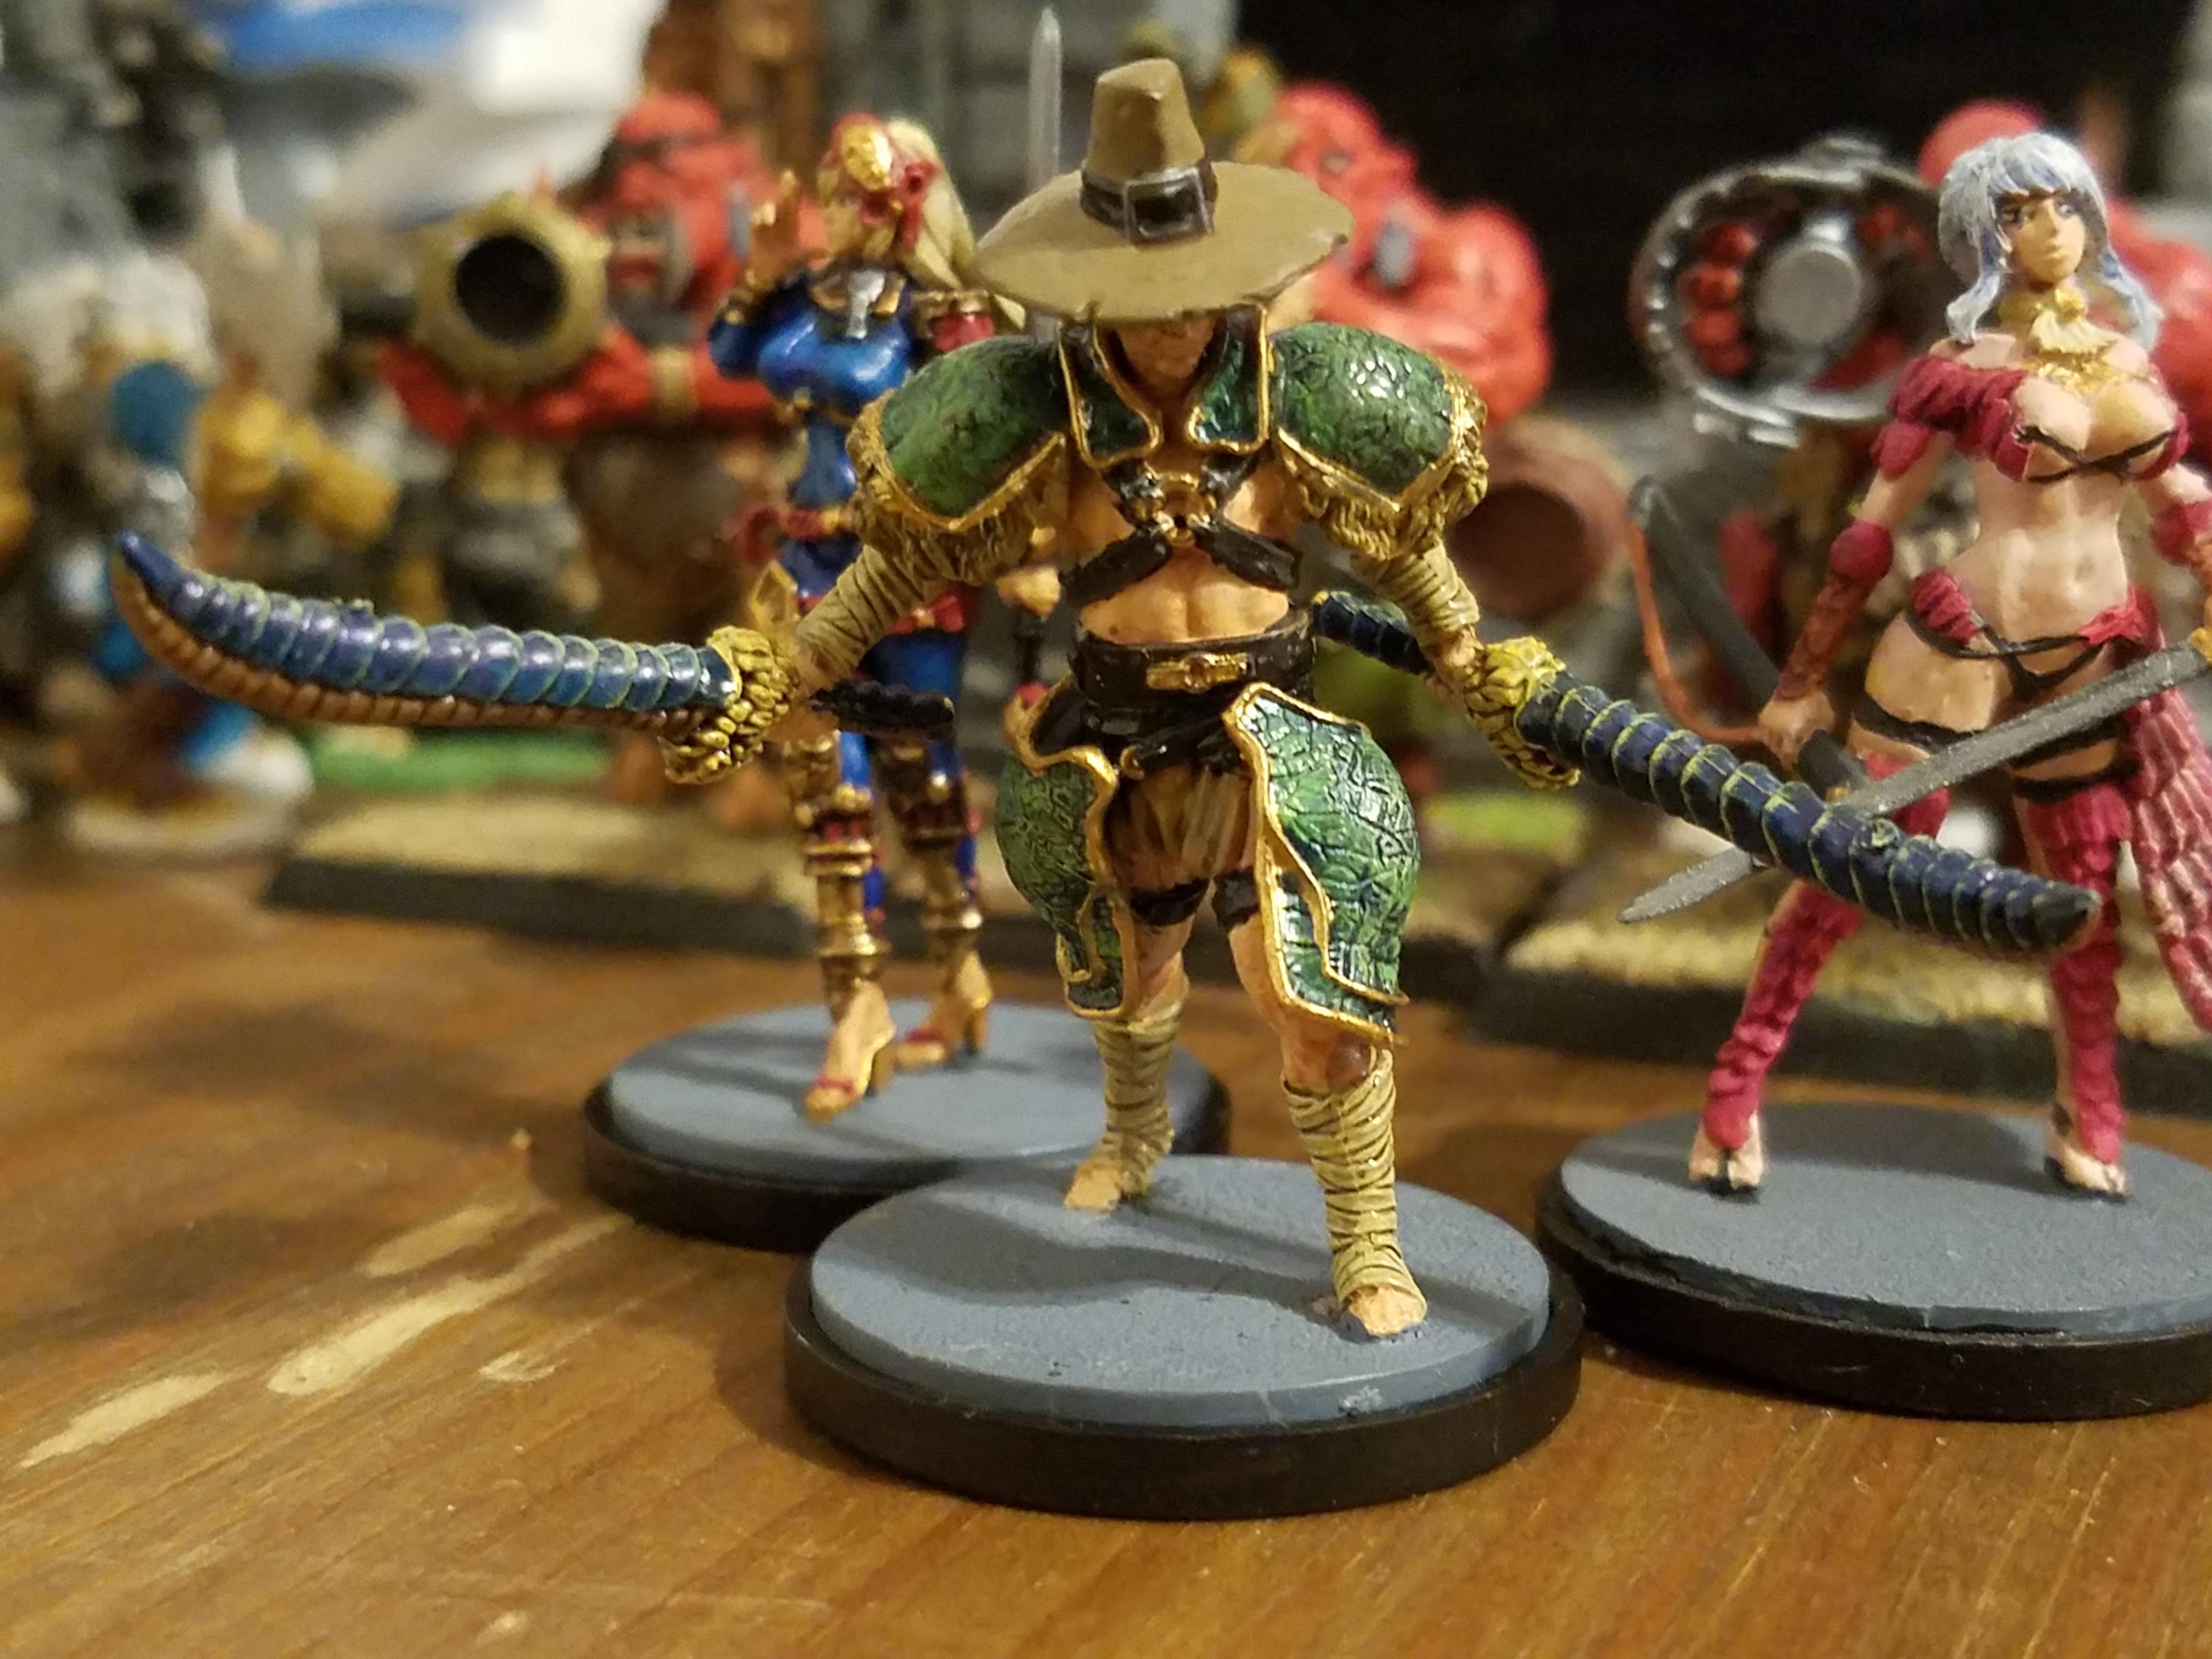 Dung Beetle Knight, Kingdom Death, Rolling Armor, Survivor